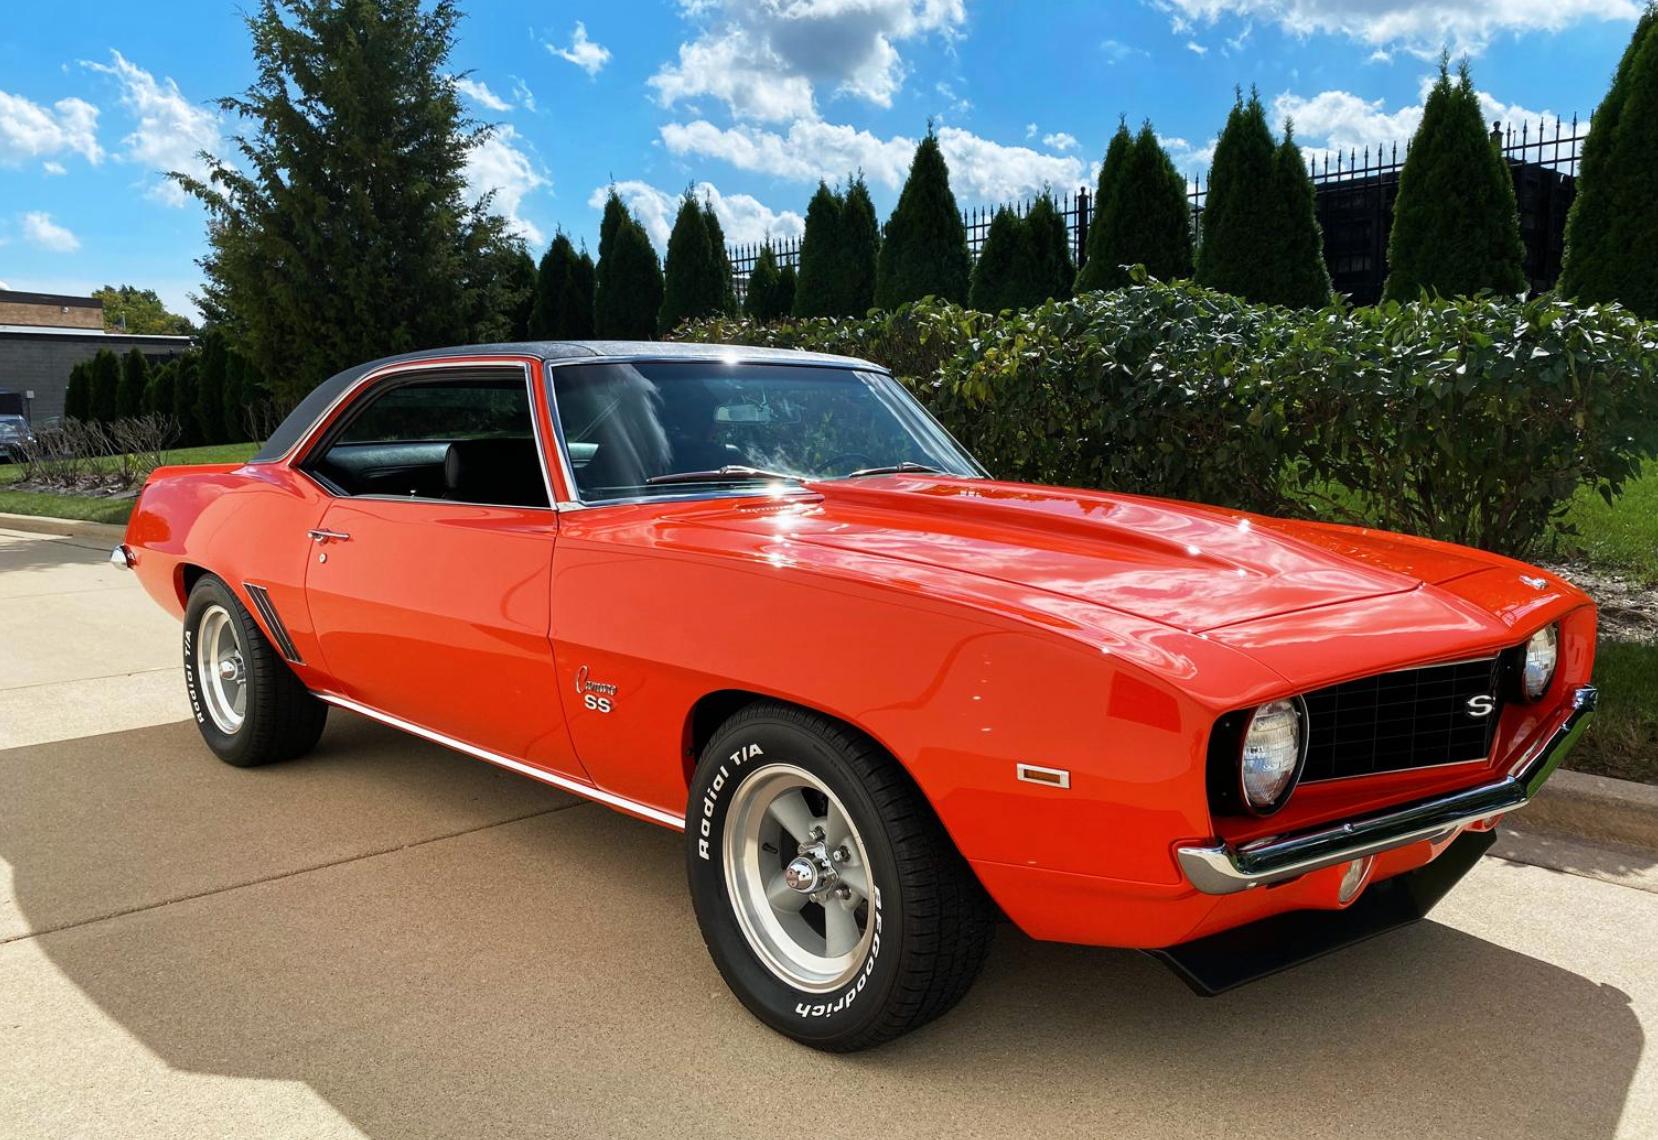 "<img src=""1969-chevy-camaro.png"" alt=""A restored 1969 Chevrolet Camaro"">"